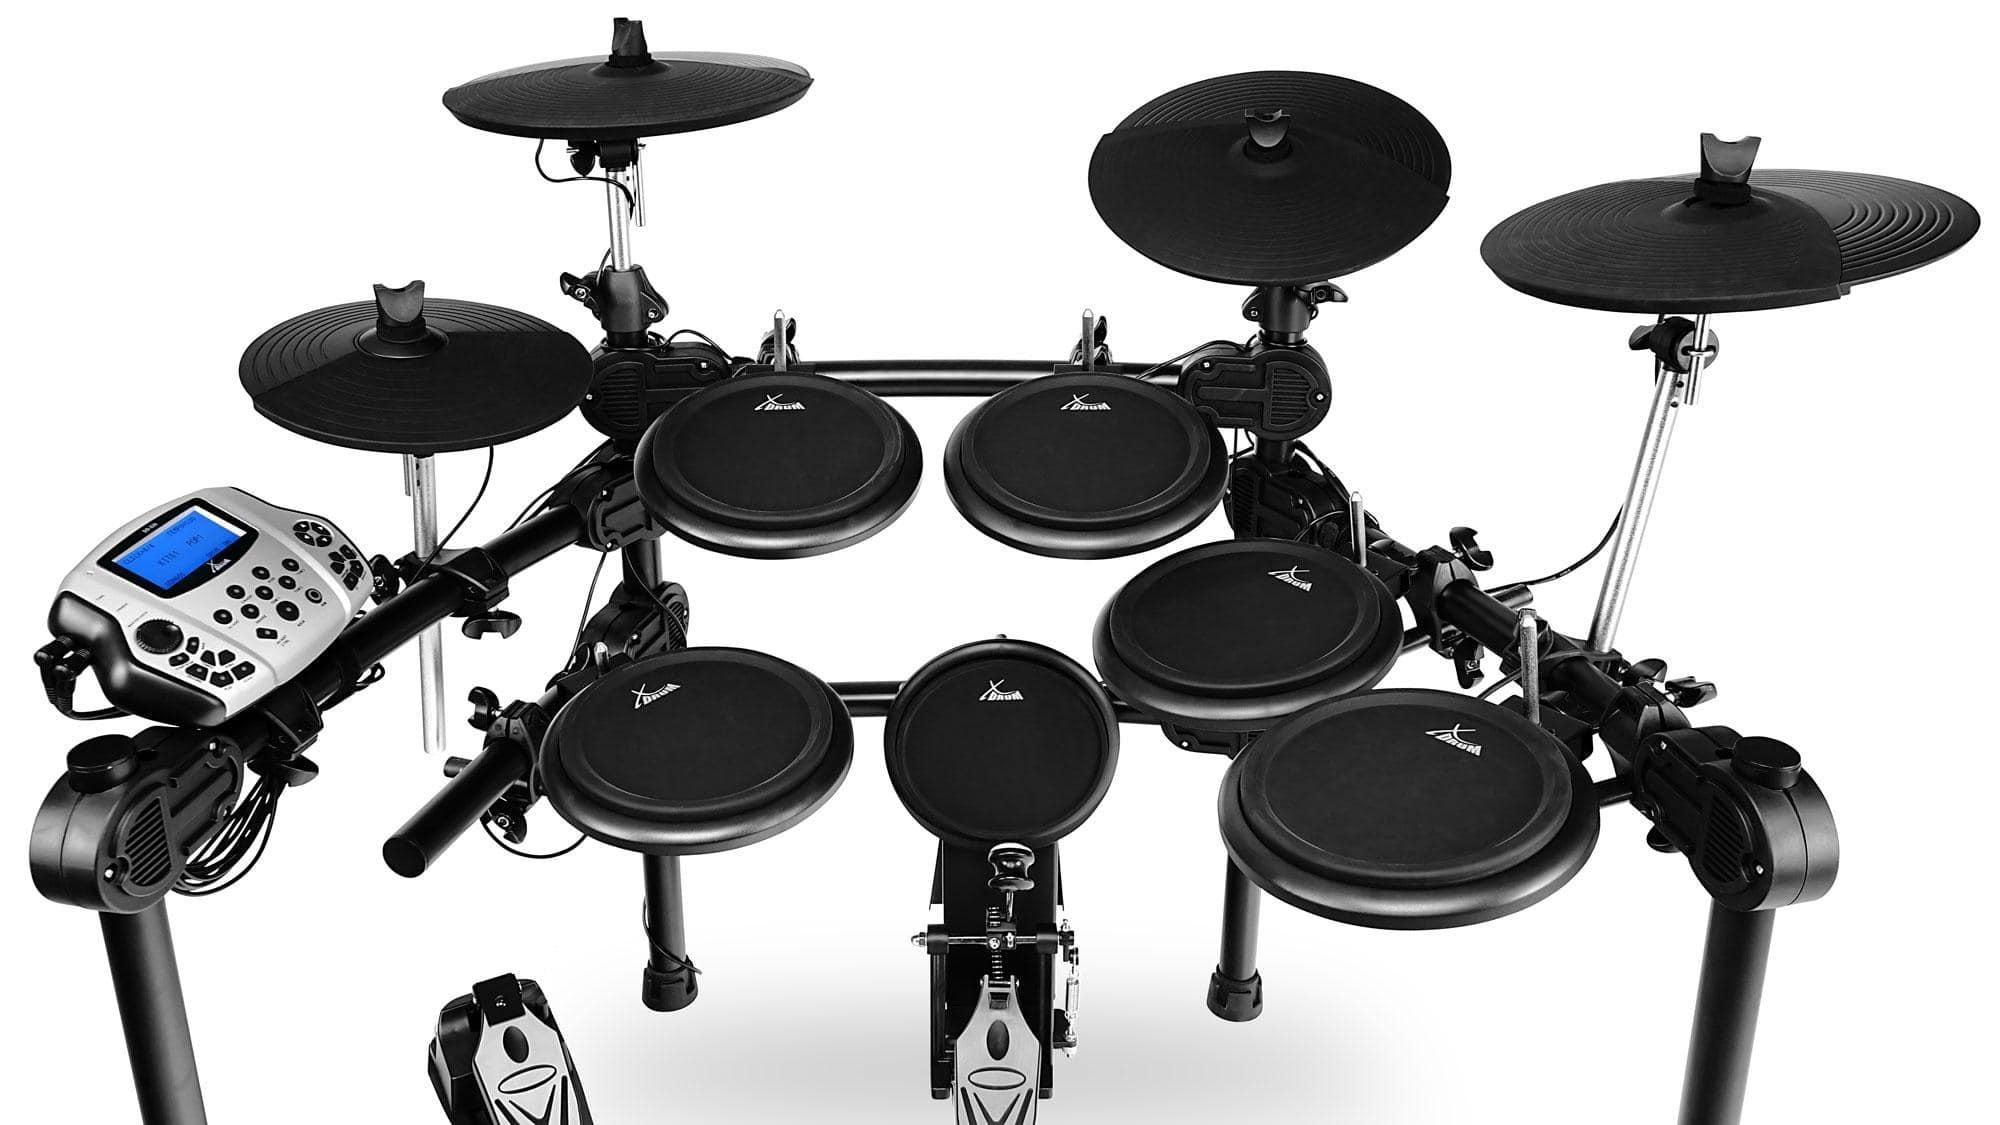 Xdrum Dd 520 Plus Electronic Drum Kit